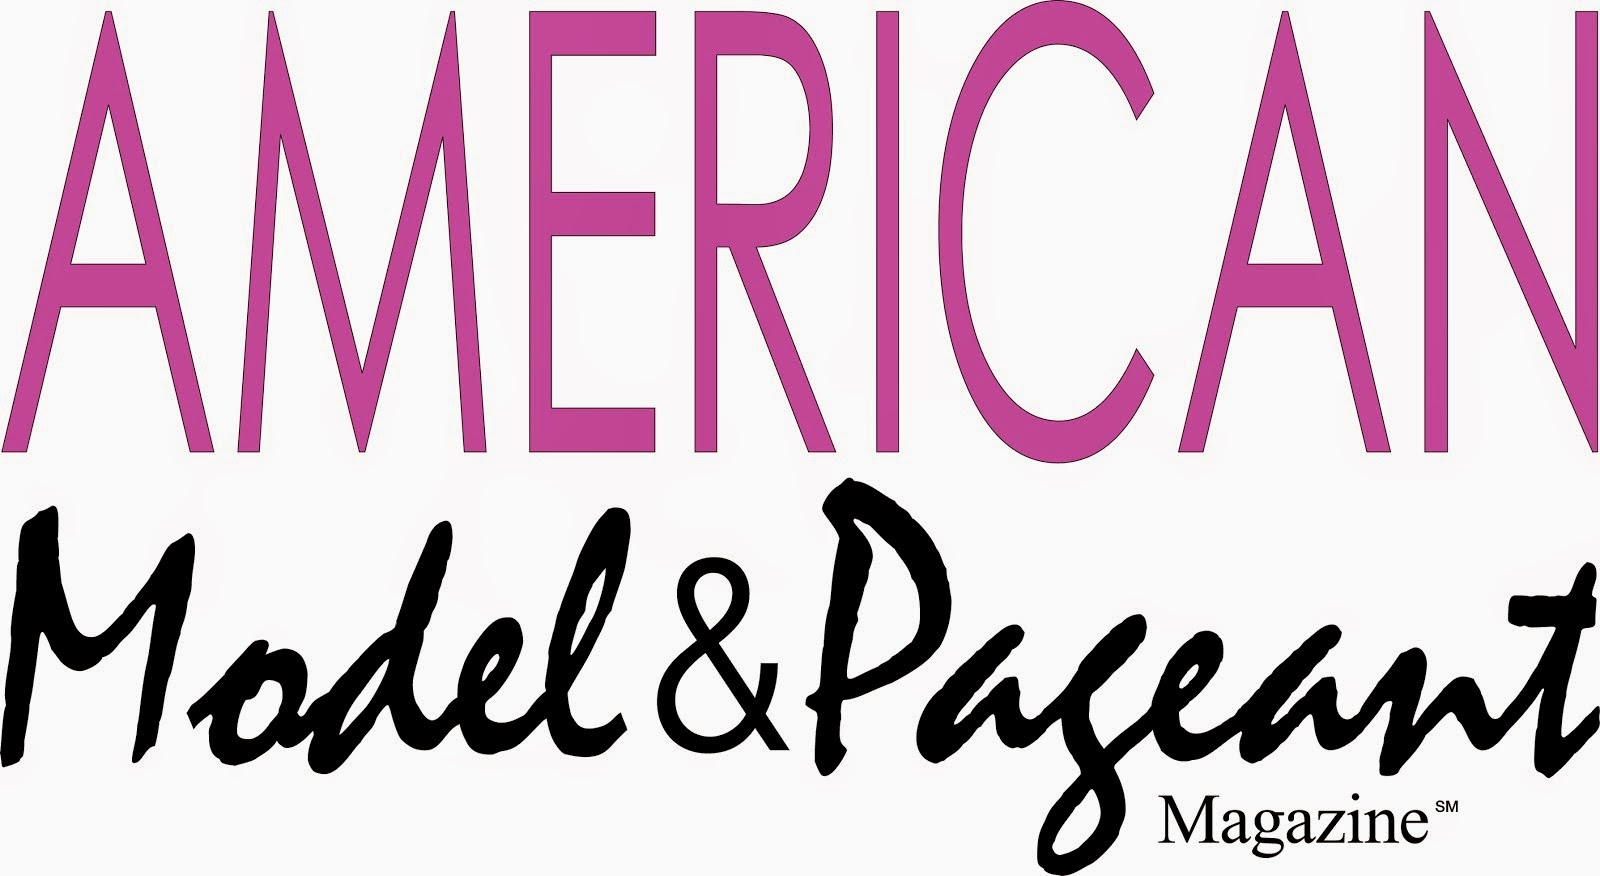 American Model & Pageant Magazine